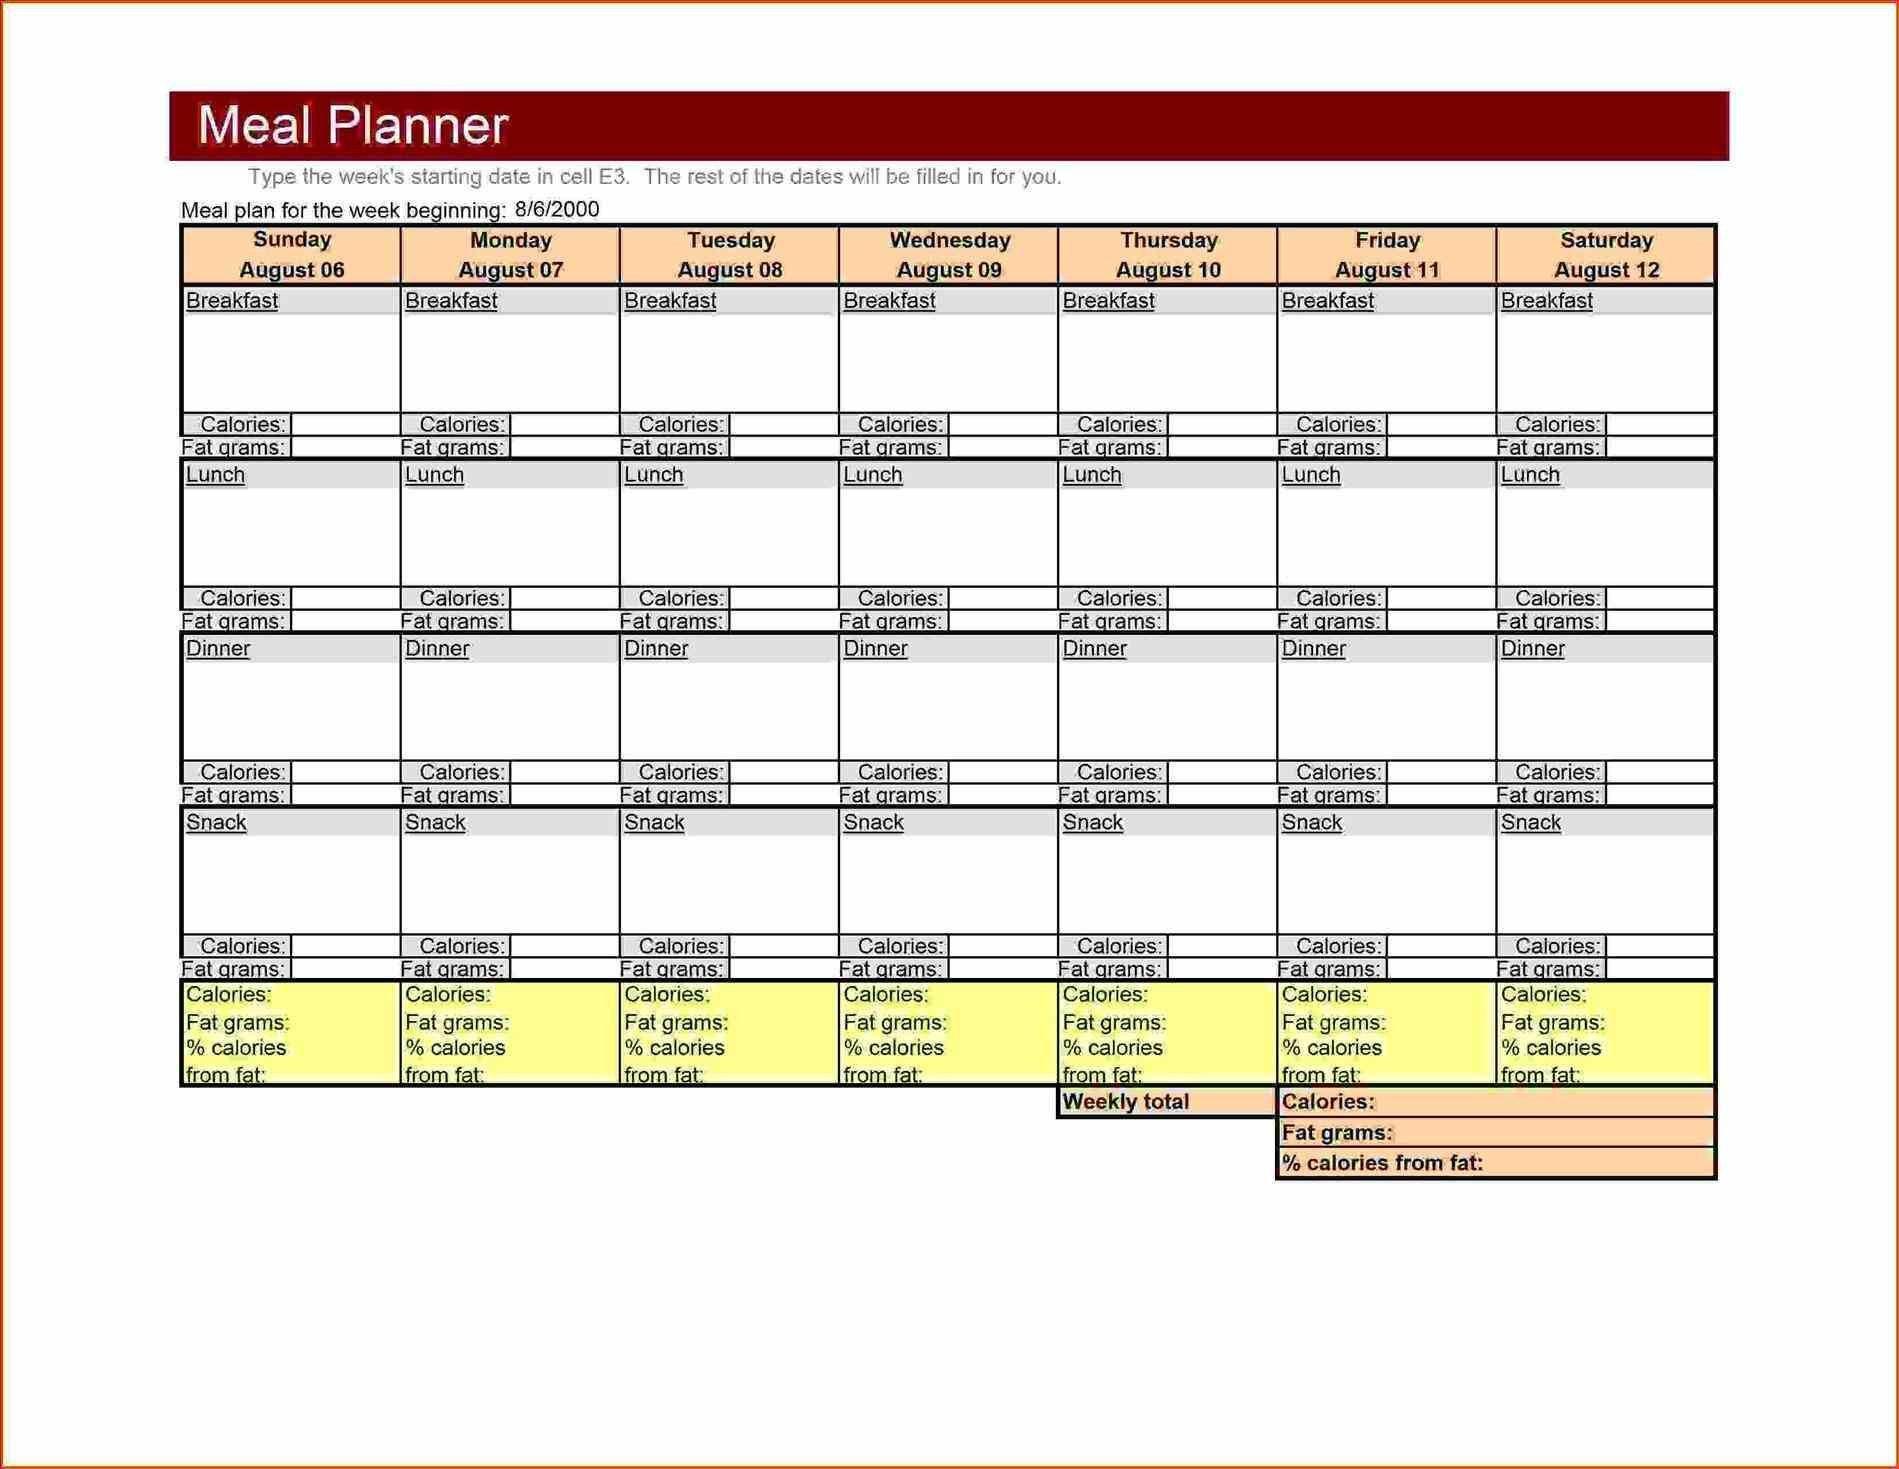 Bodybuilding Meal Planner Template Large Weekly Menu Template Excel Meal Planner